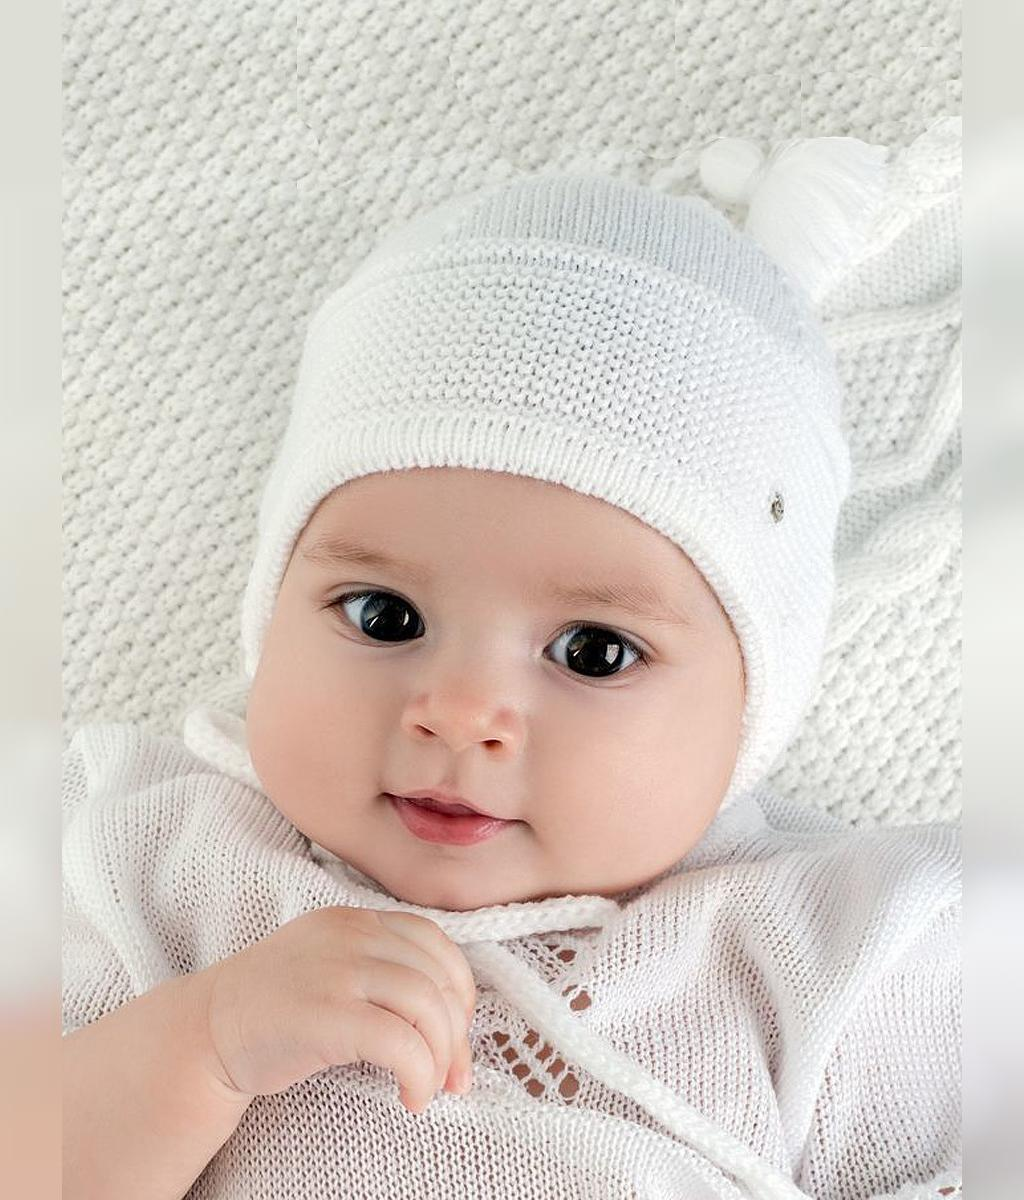 مدل کلاه بافتنی نوزادی شیک